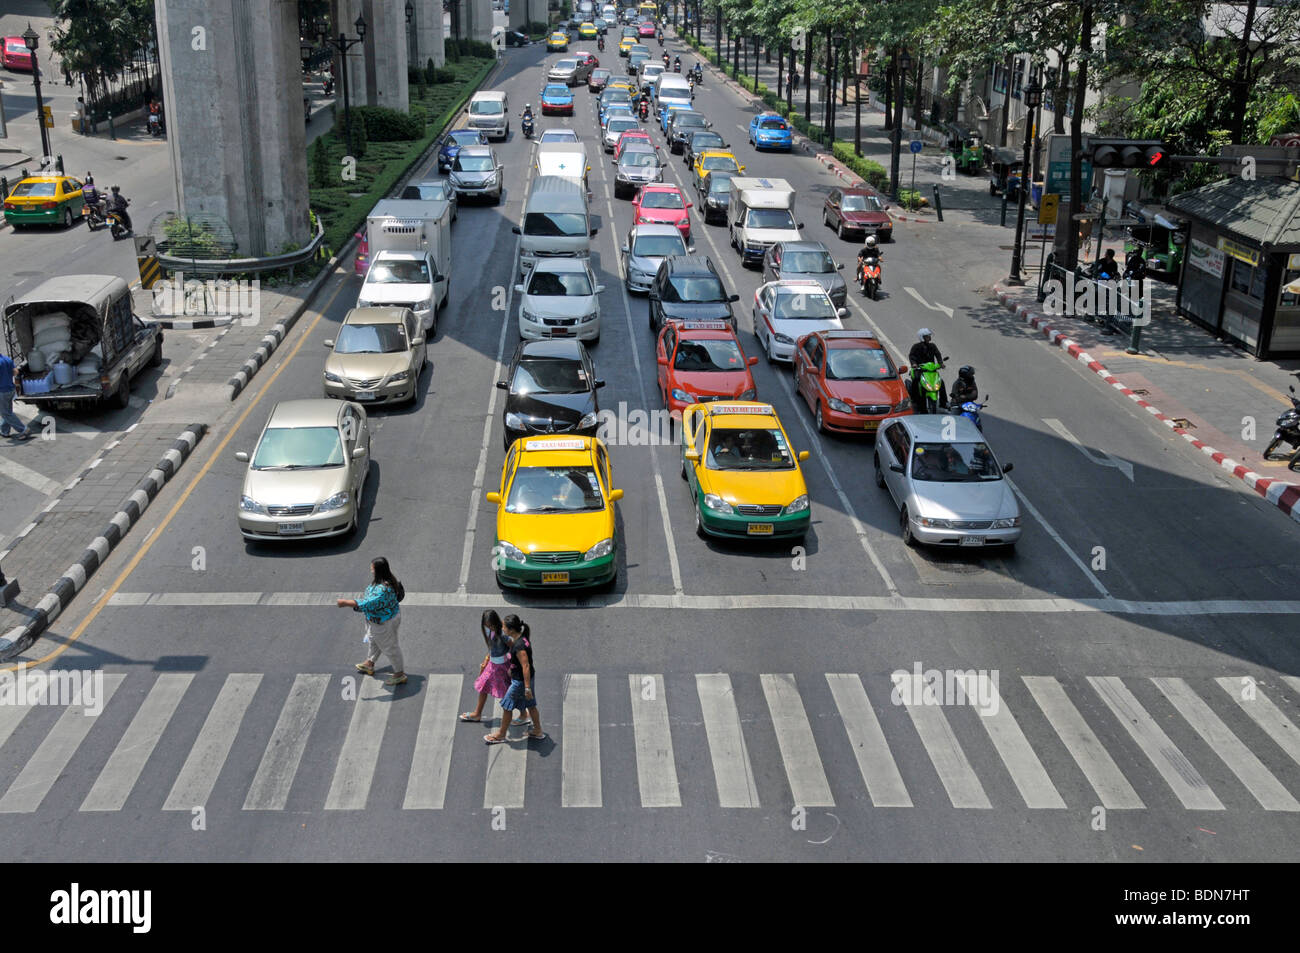 Motorbikers, moped riders and cars in traffic chaos, Ratchamnoen Klang Road, Bangkok, Thailand, Asia - Stock Image